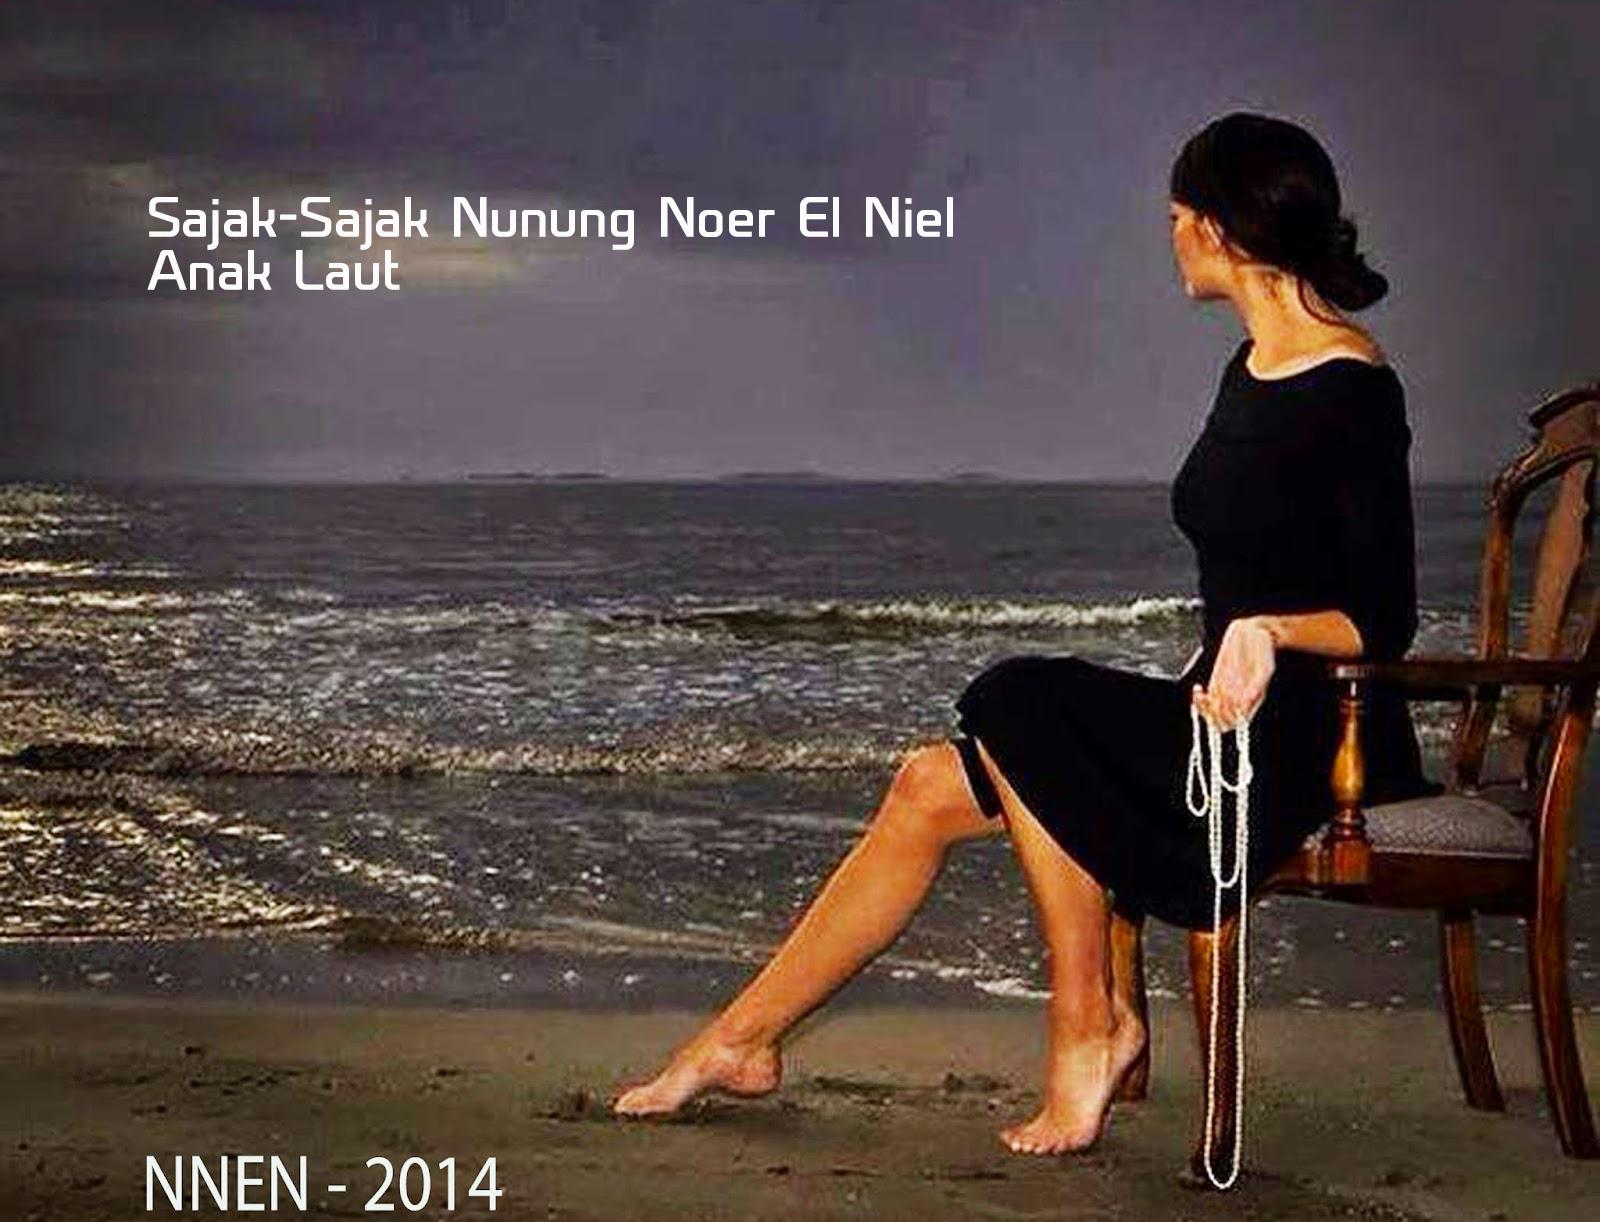 Sajak-Sajak Nunung Noer El Niel - Anak Laut